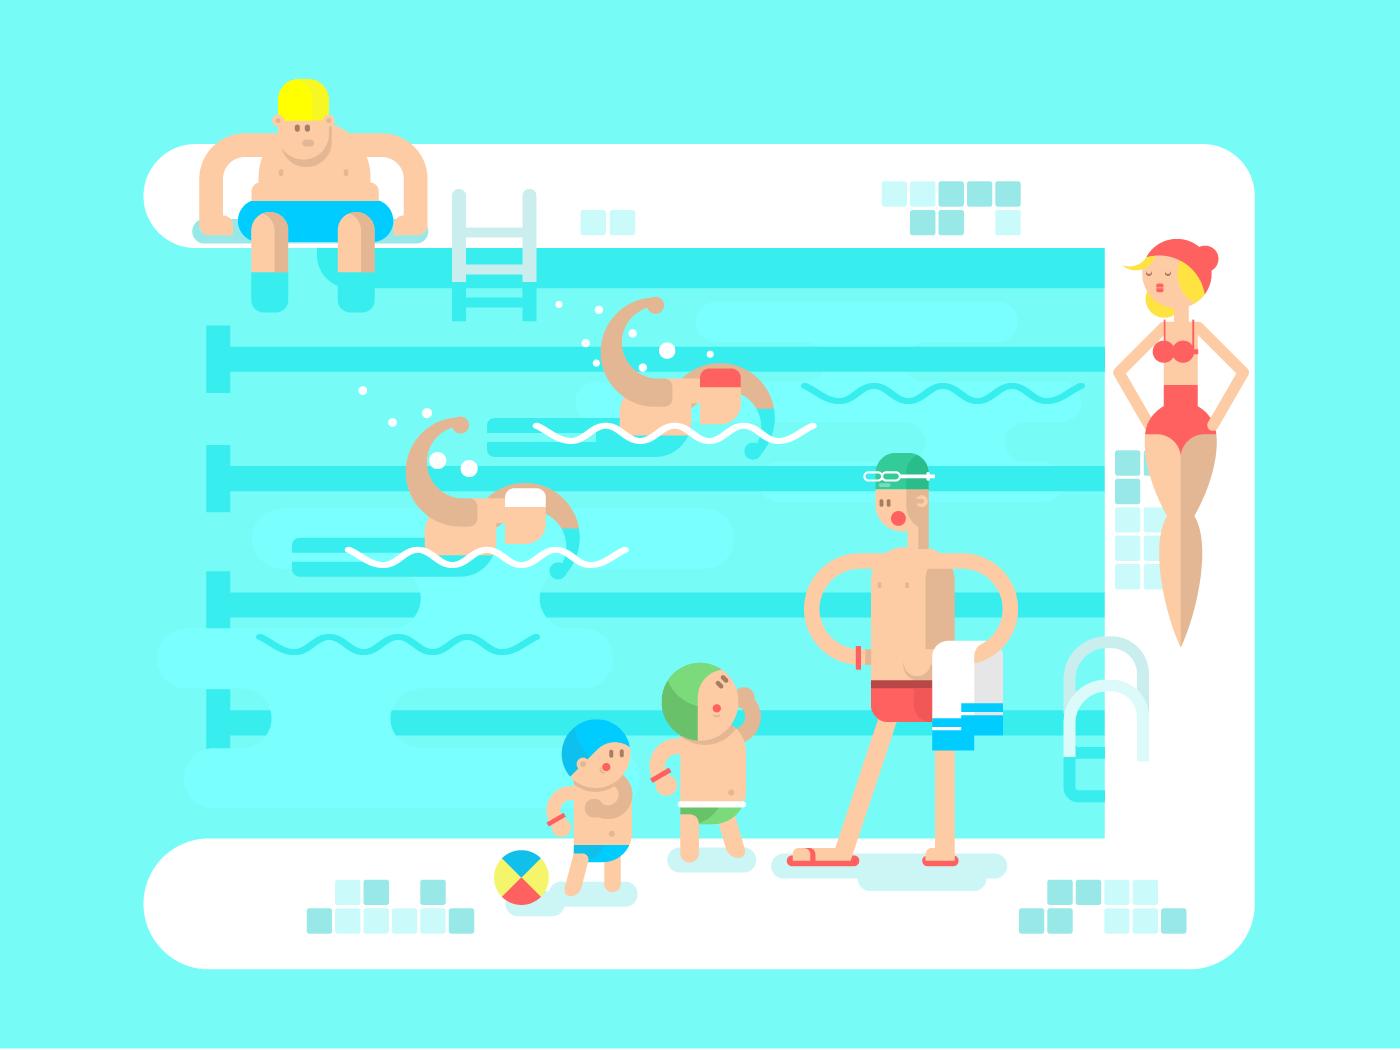 Public swimming pool flat vector illustration